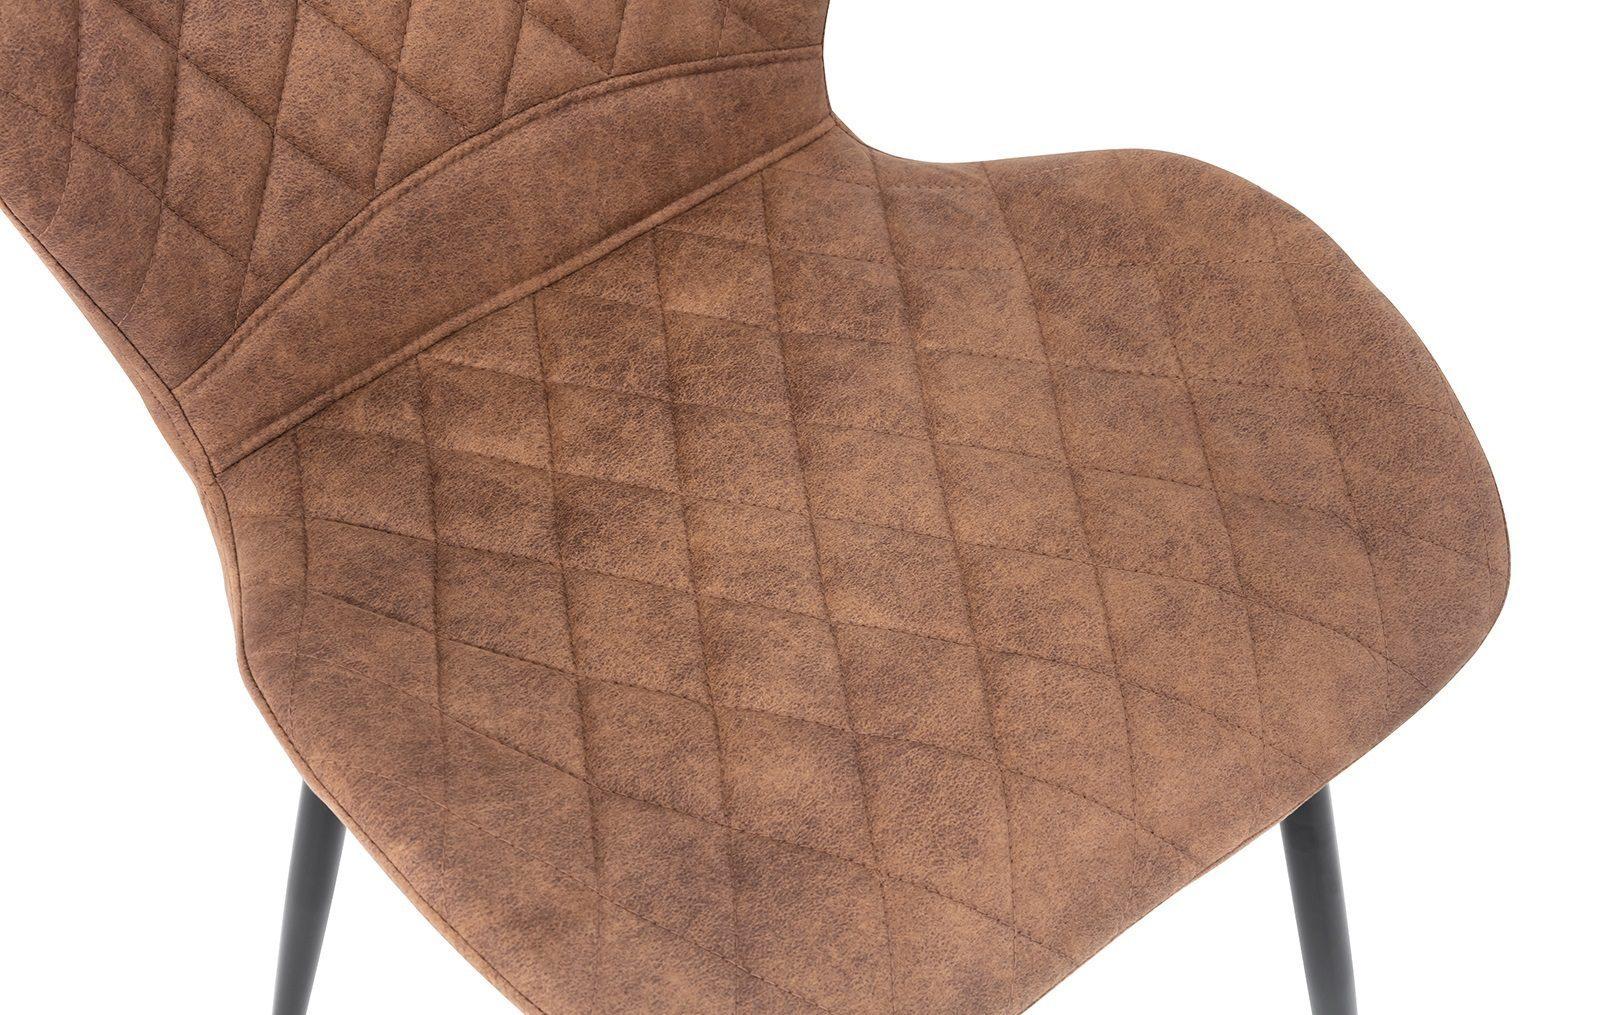 Стул LARA FSC114 коричневый